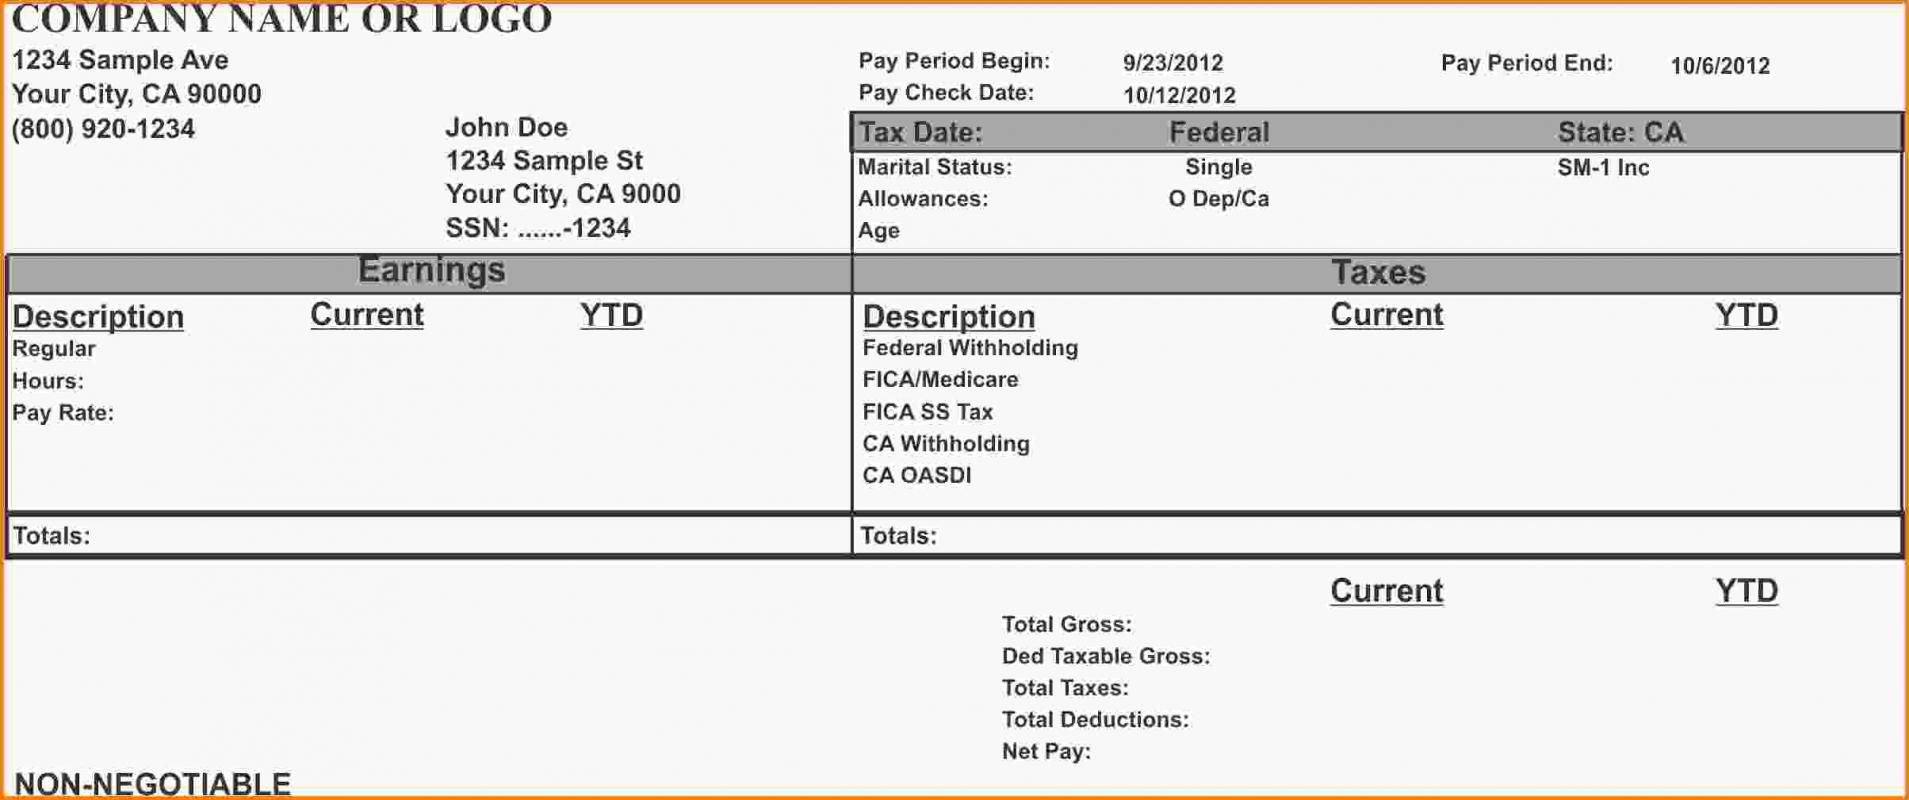 Quickbooks Pay Stub Template Payroll template, Statement